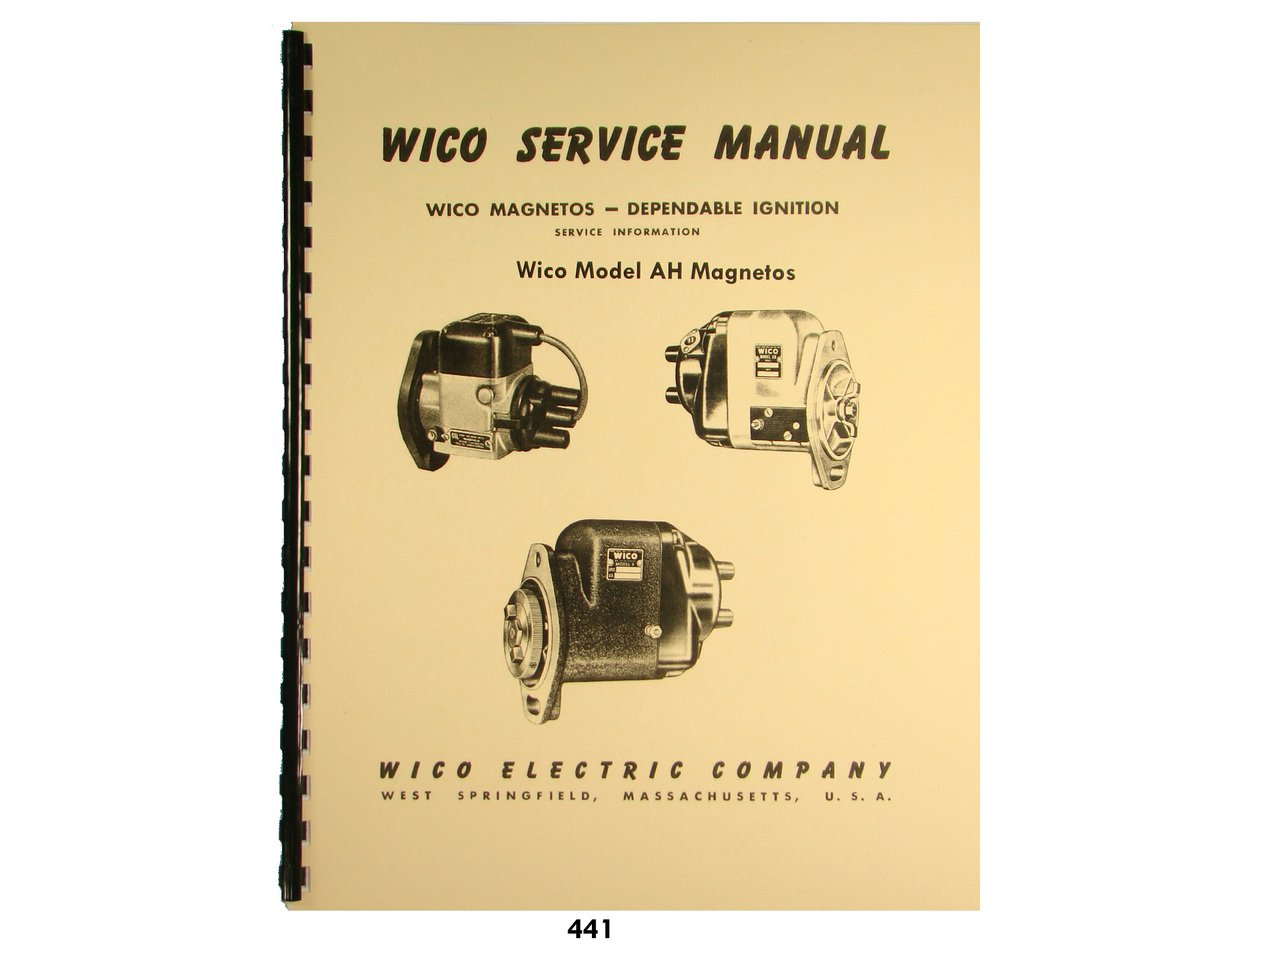 Wico Magneto Diagram Wiring Schemes Hunt Service Parts Manual For Ah Magnetos Amazon Rh Com Fairbanks Morse Engine